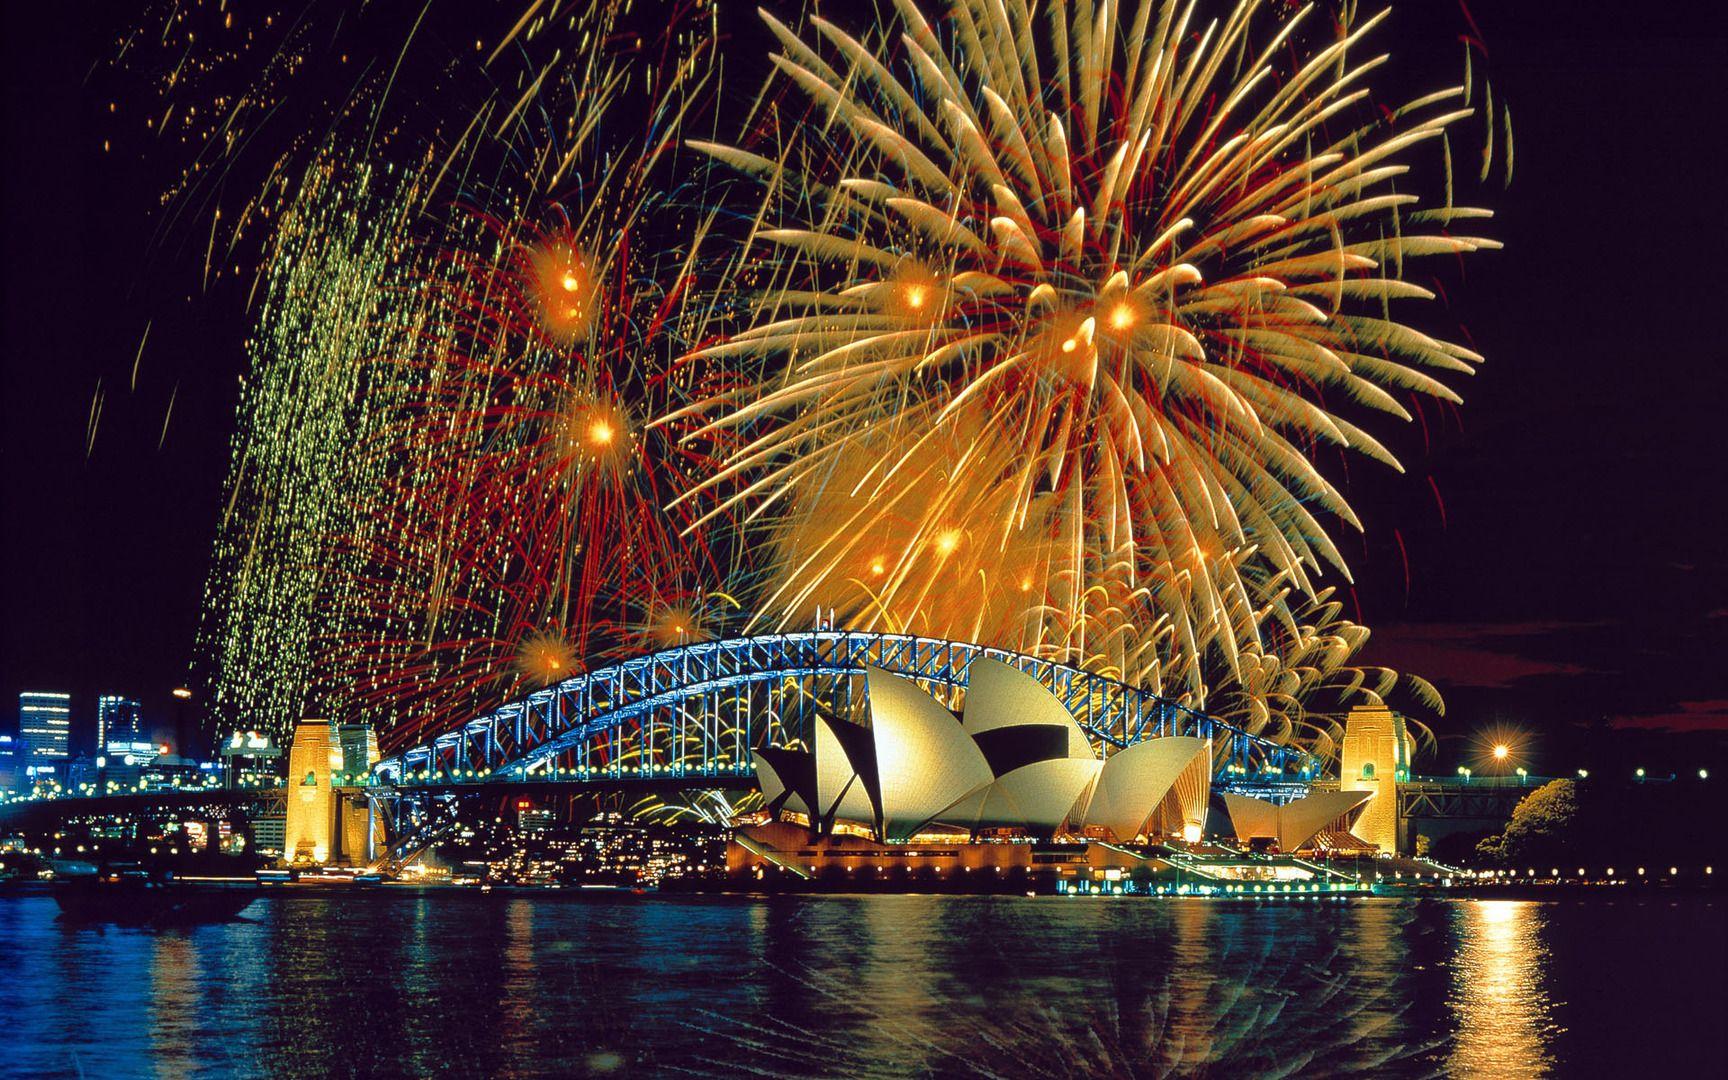 Best Spots To Enjoy The Sydney New Year S Eve Fireworks New Years Eve Fireworks New Year Fireworks Australia Wallpaper